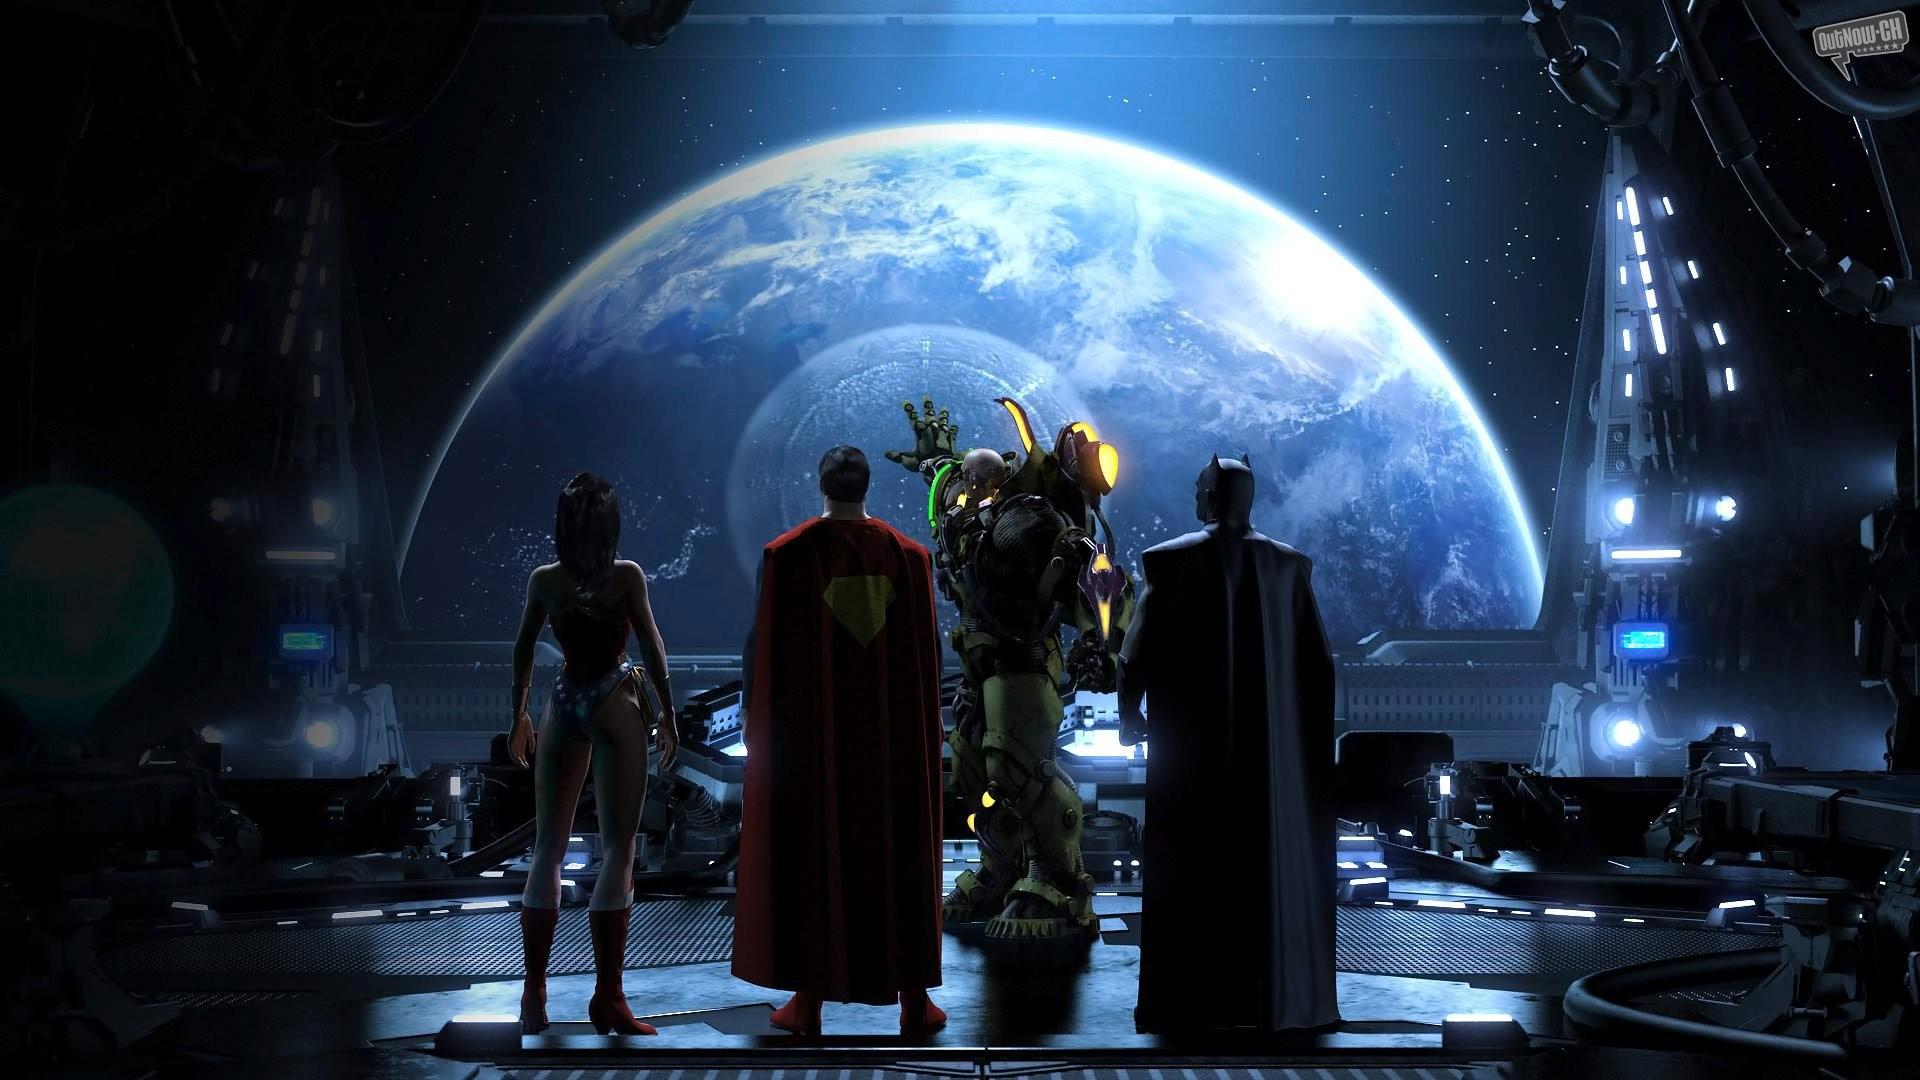 41 Justice League Wallpaper Hd On Wallpapersafari